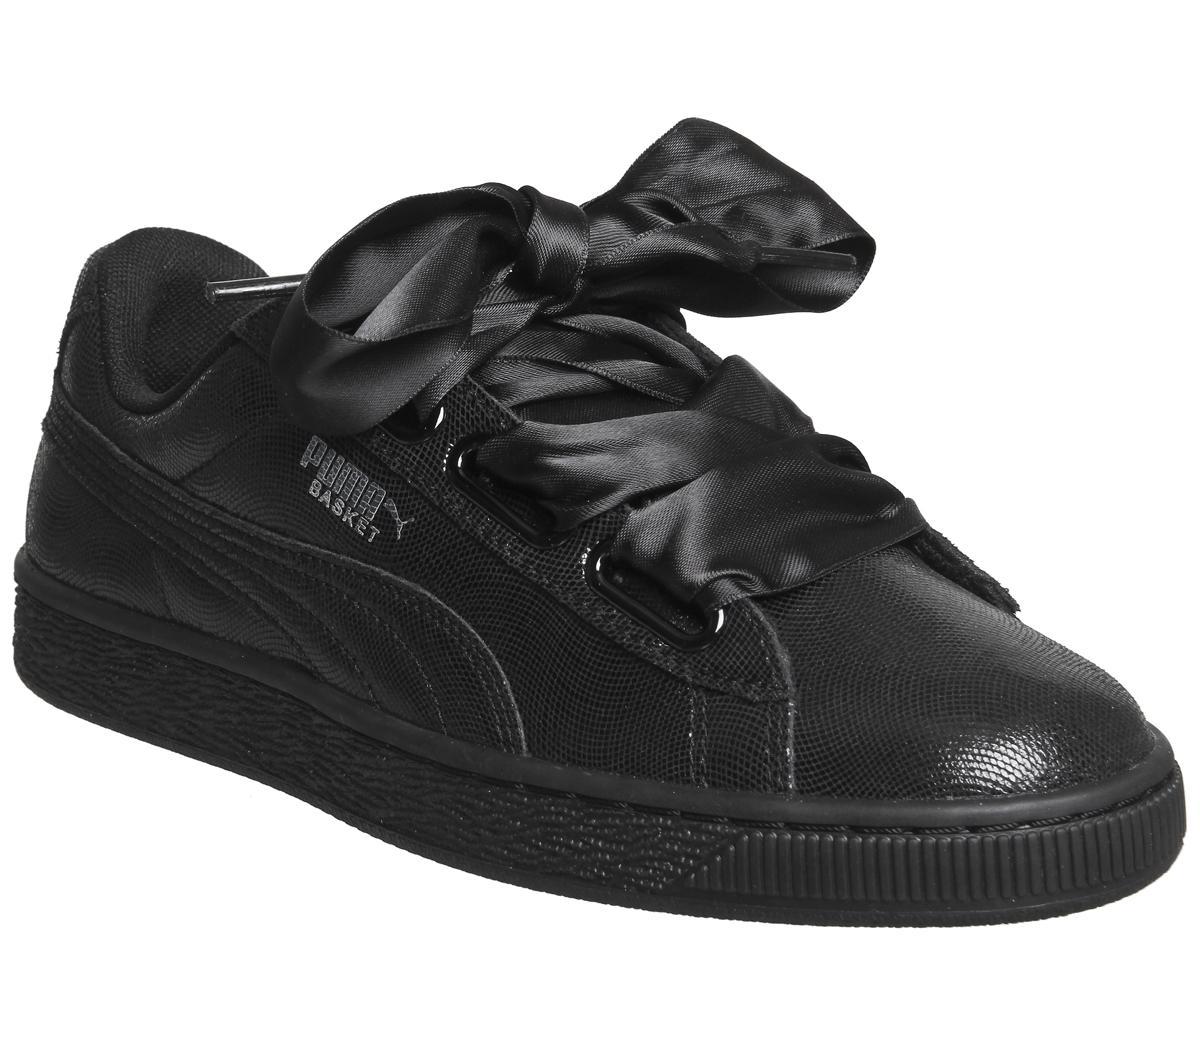 puma black ribbon shoes - 55% OFF - ser